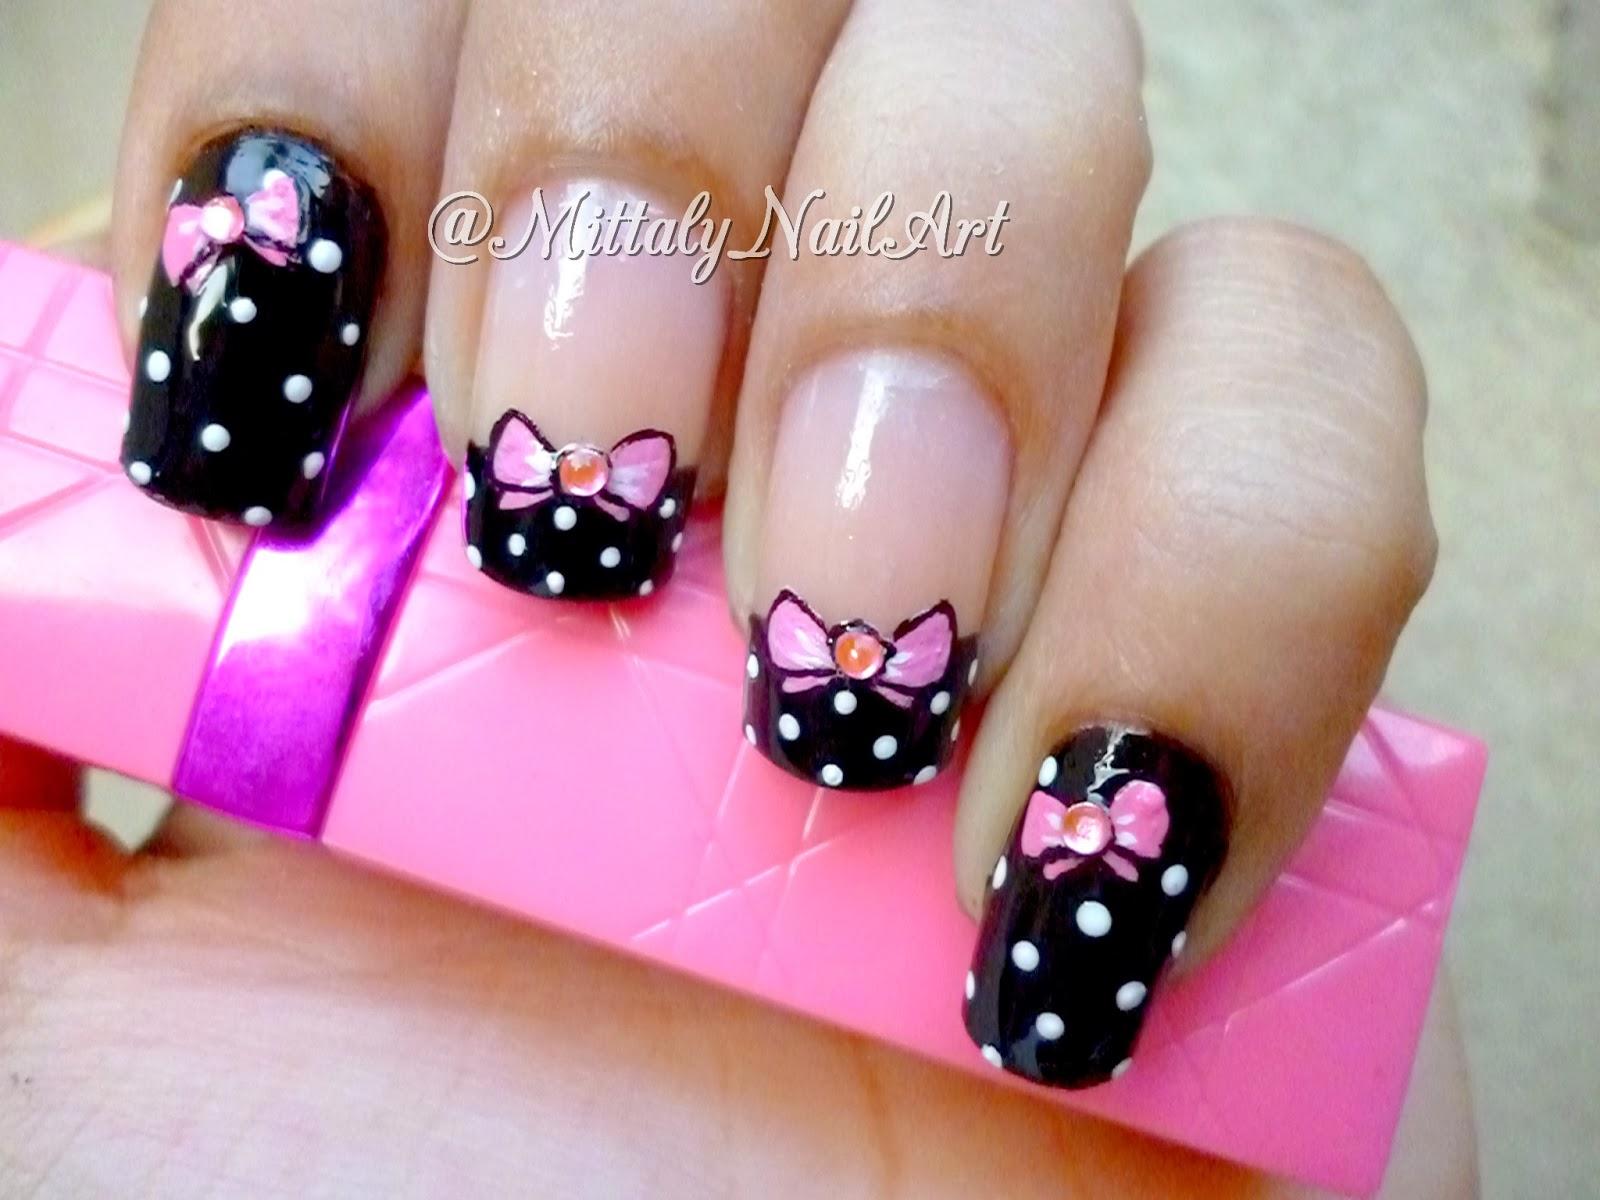 Mittaly Nail Art: Pink Bow nail art - Unhas decoradas lacinho rosa com ...